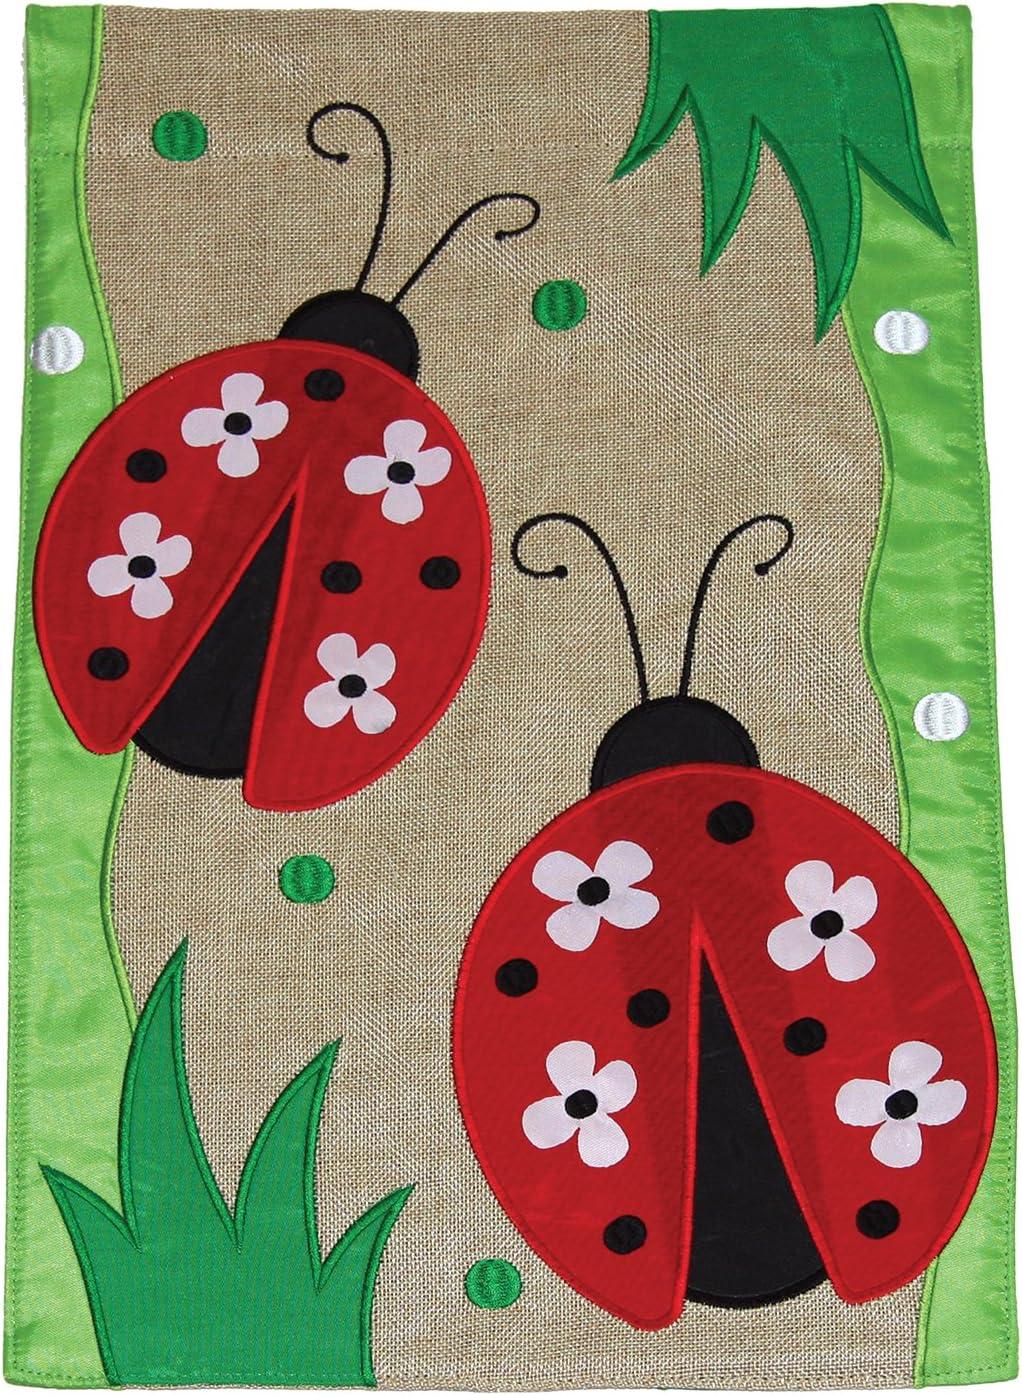 Toland Home Garden Daisy Ladies 12 x 18 Inch Decorative Cute Ladybug Flower Burlap Flag